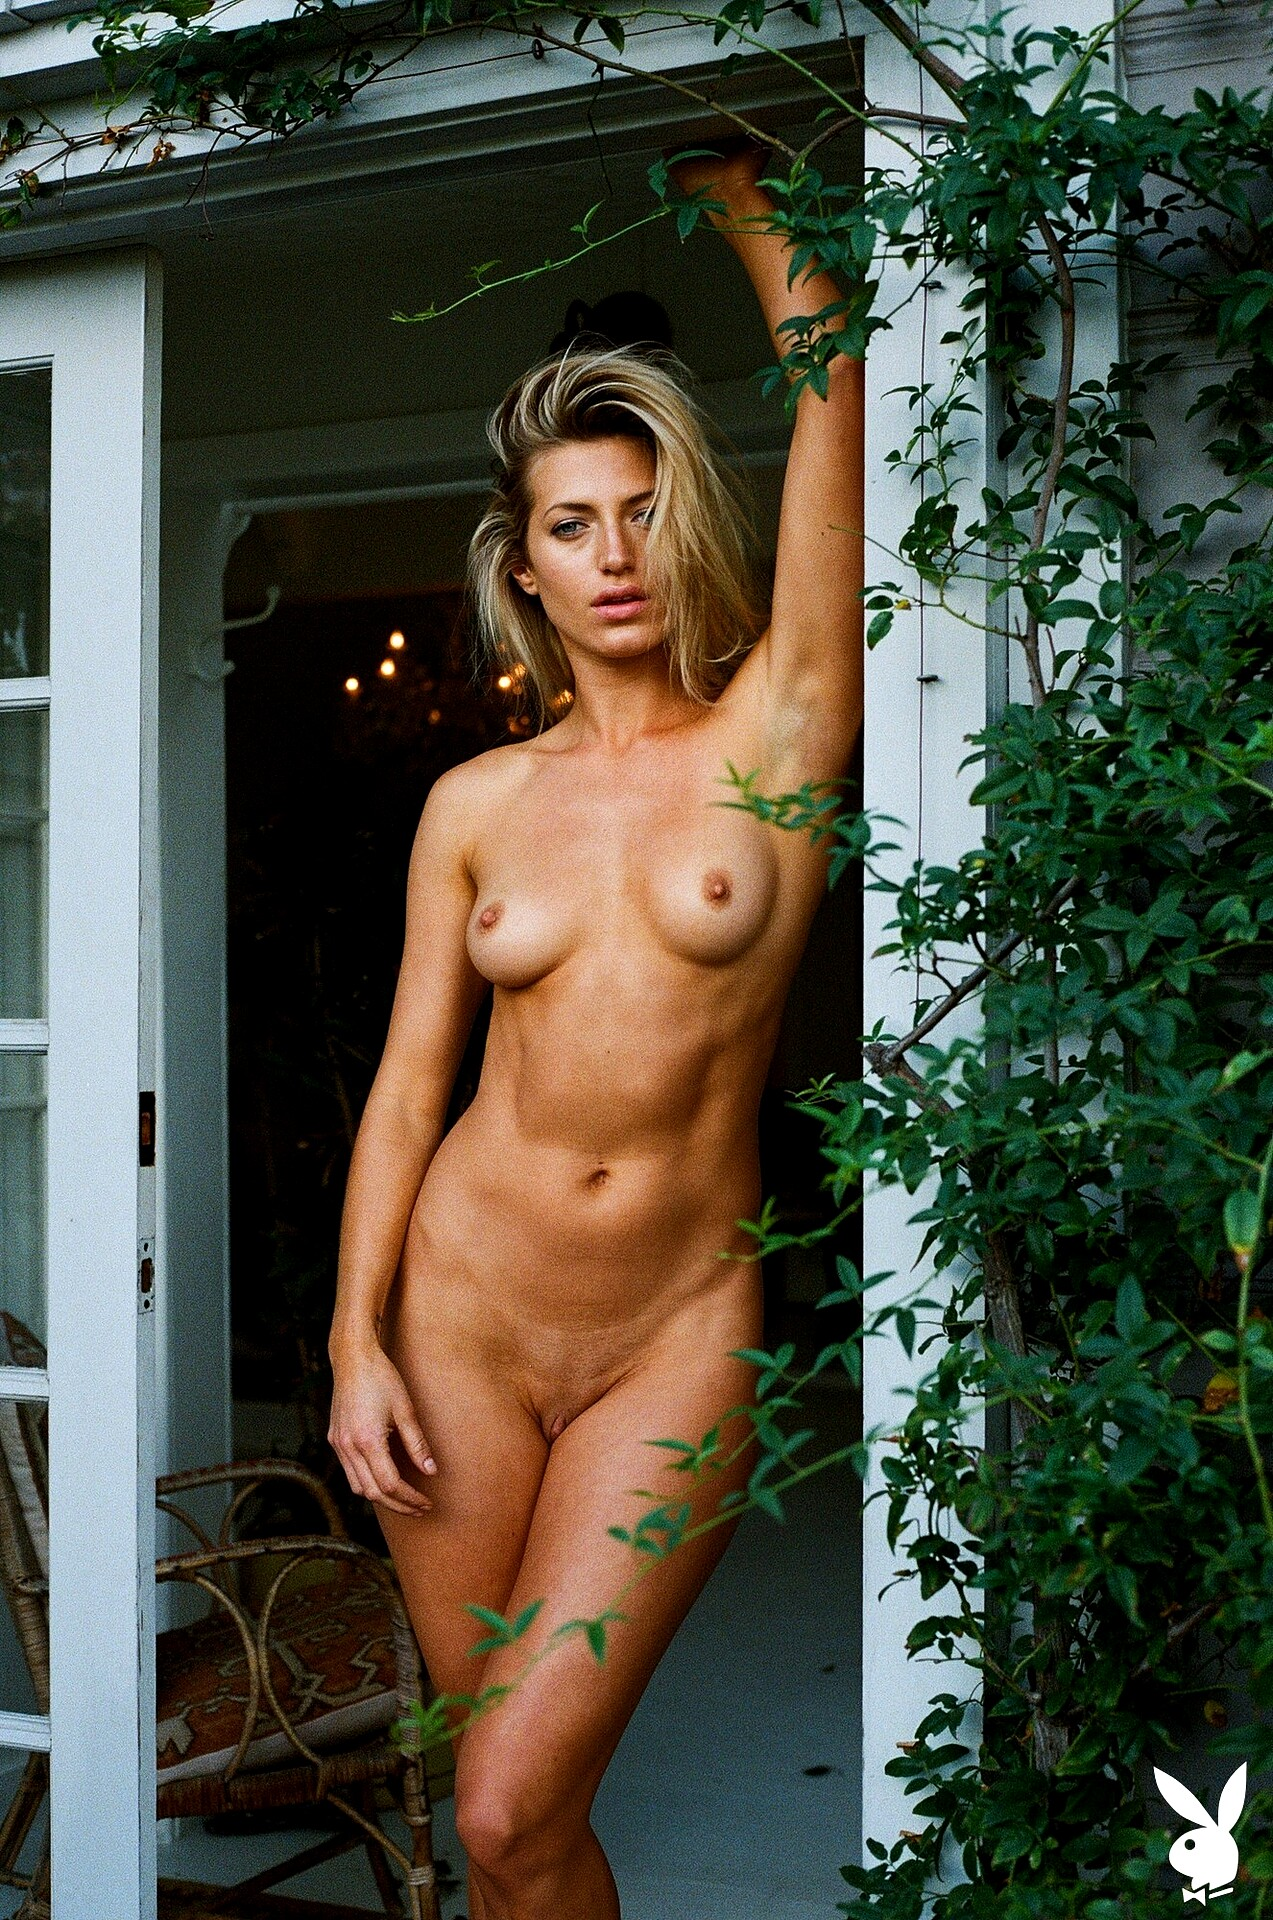 Jessica kylie nackt